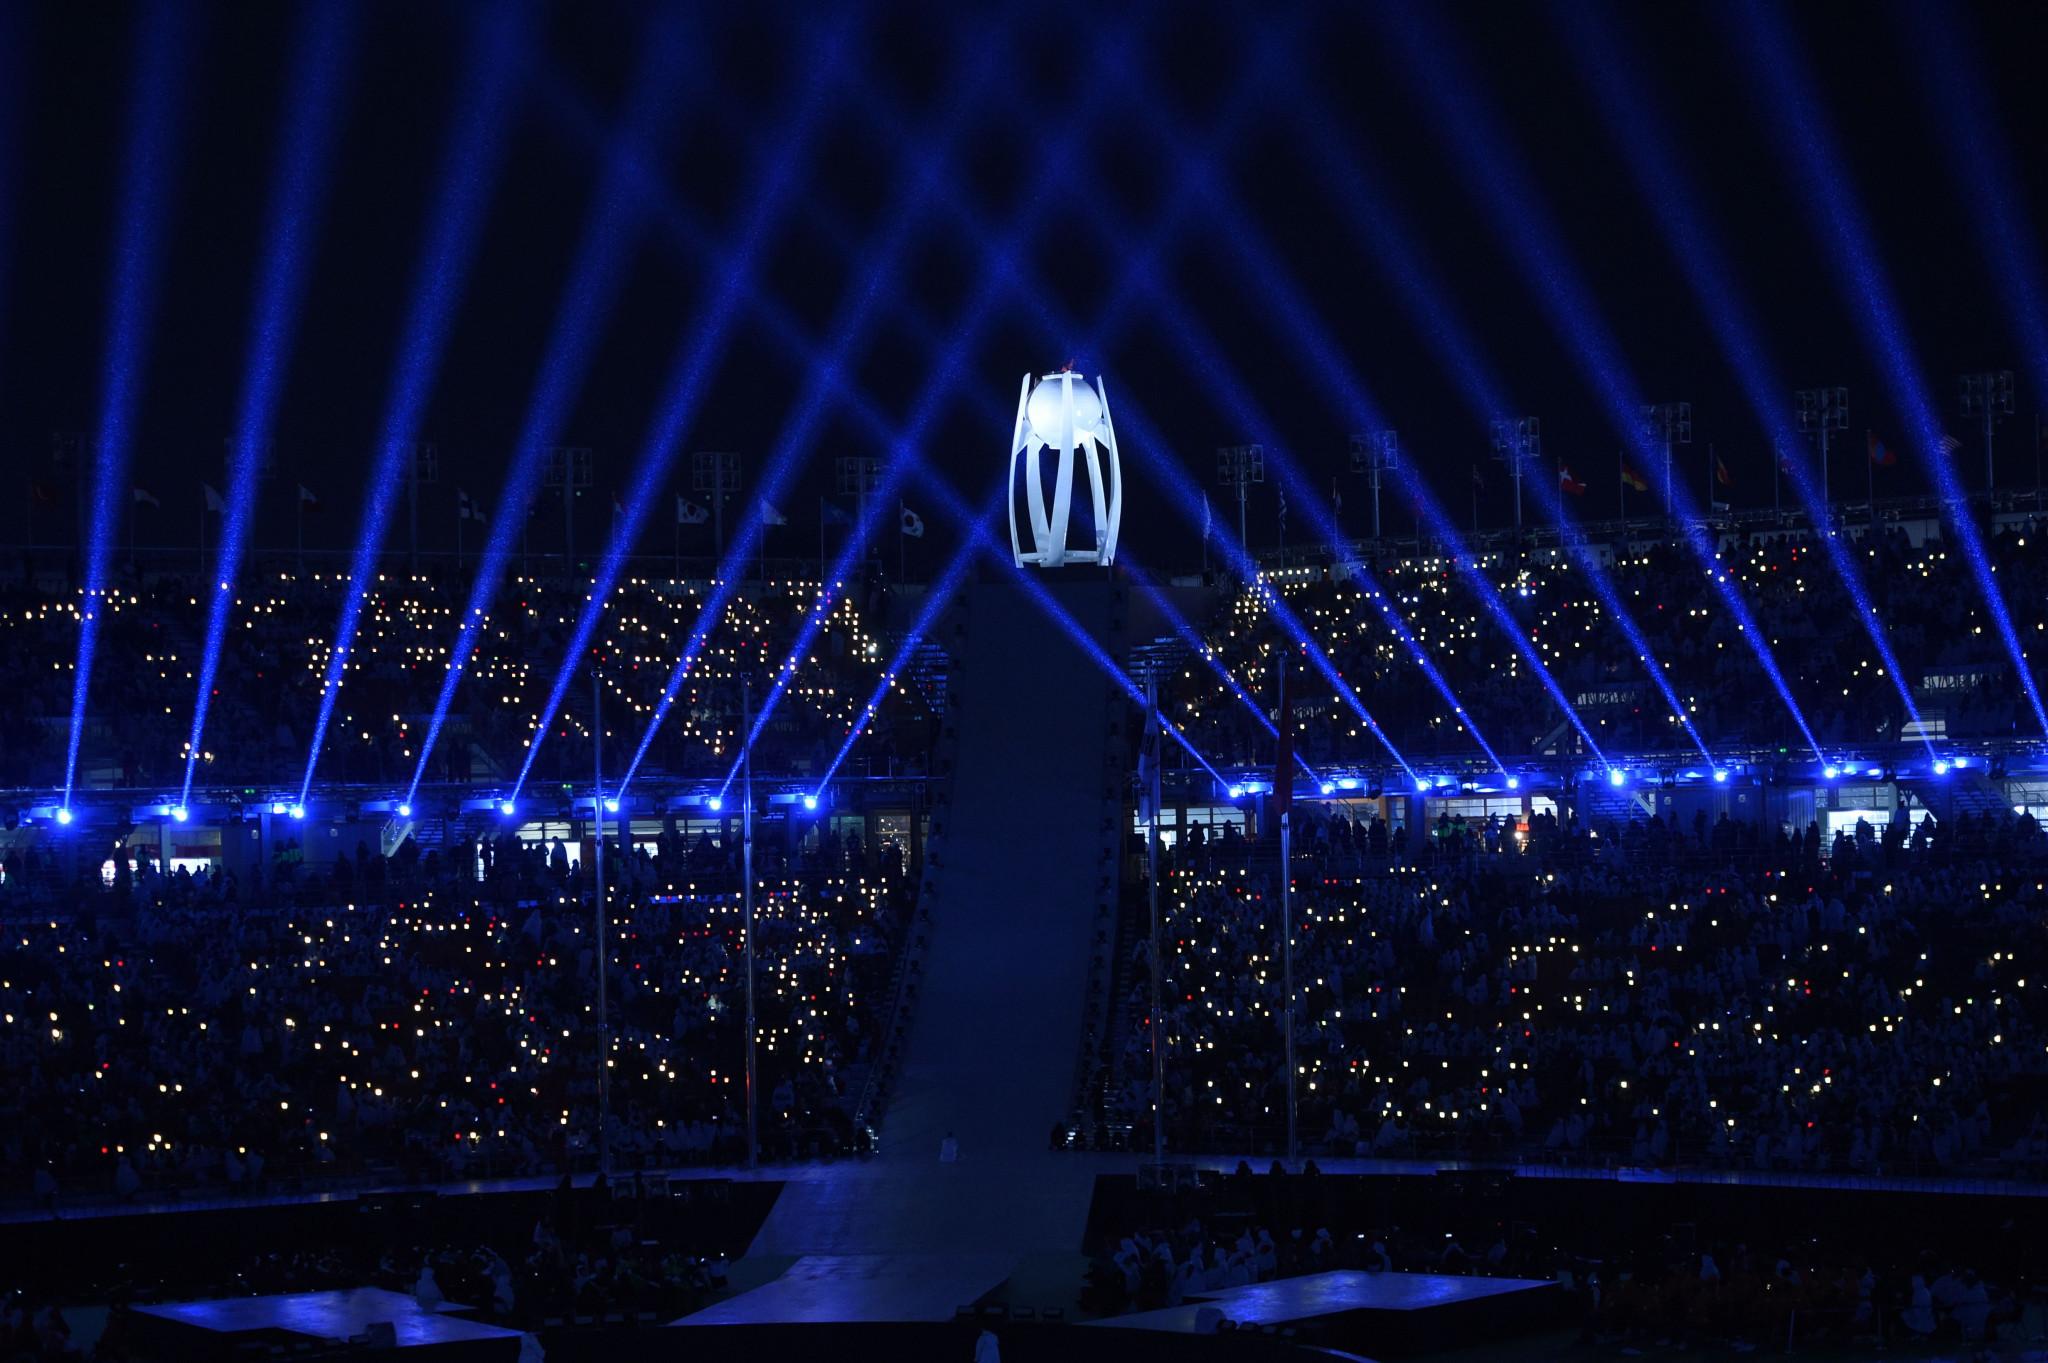 Pyeongchang 2018: Closing Ceremony